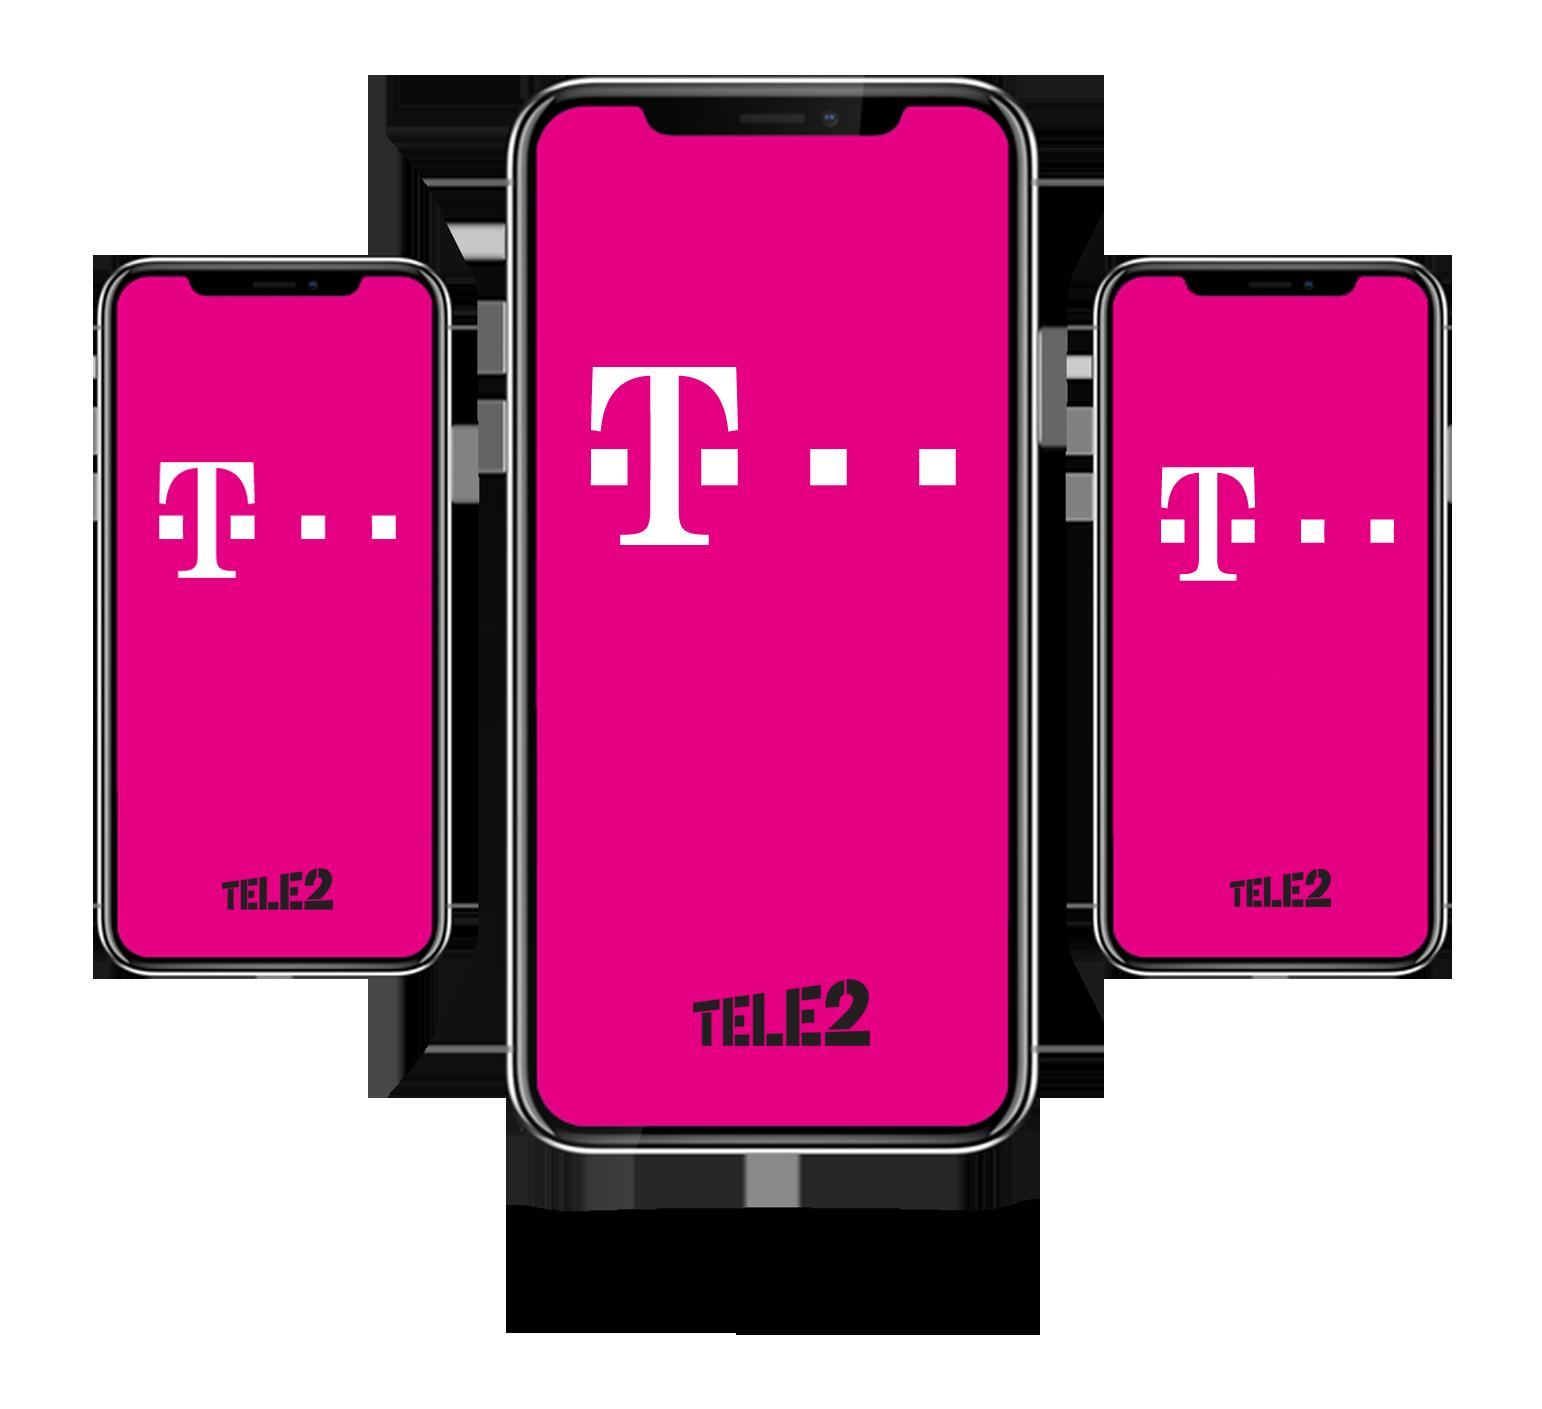 Fusie T-mobile